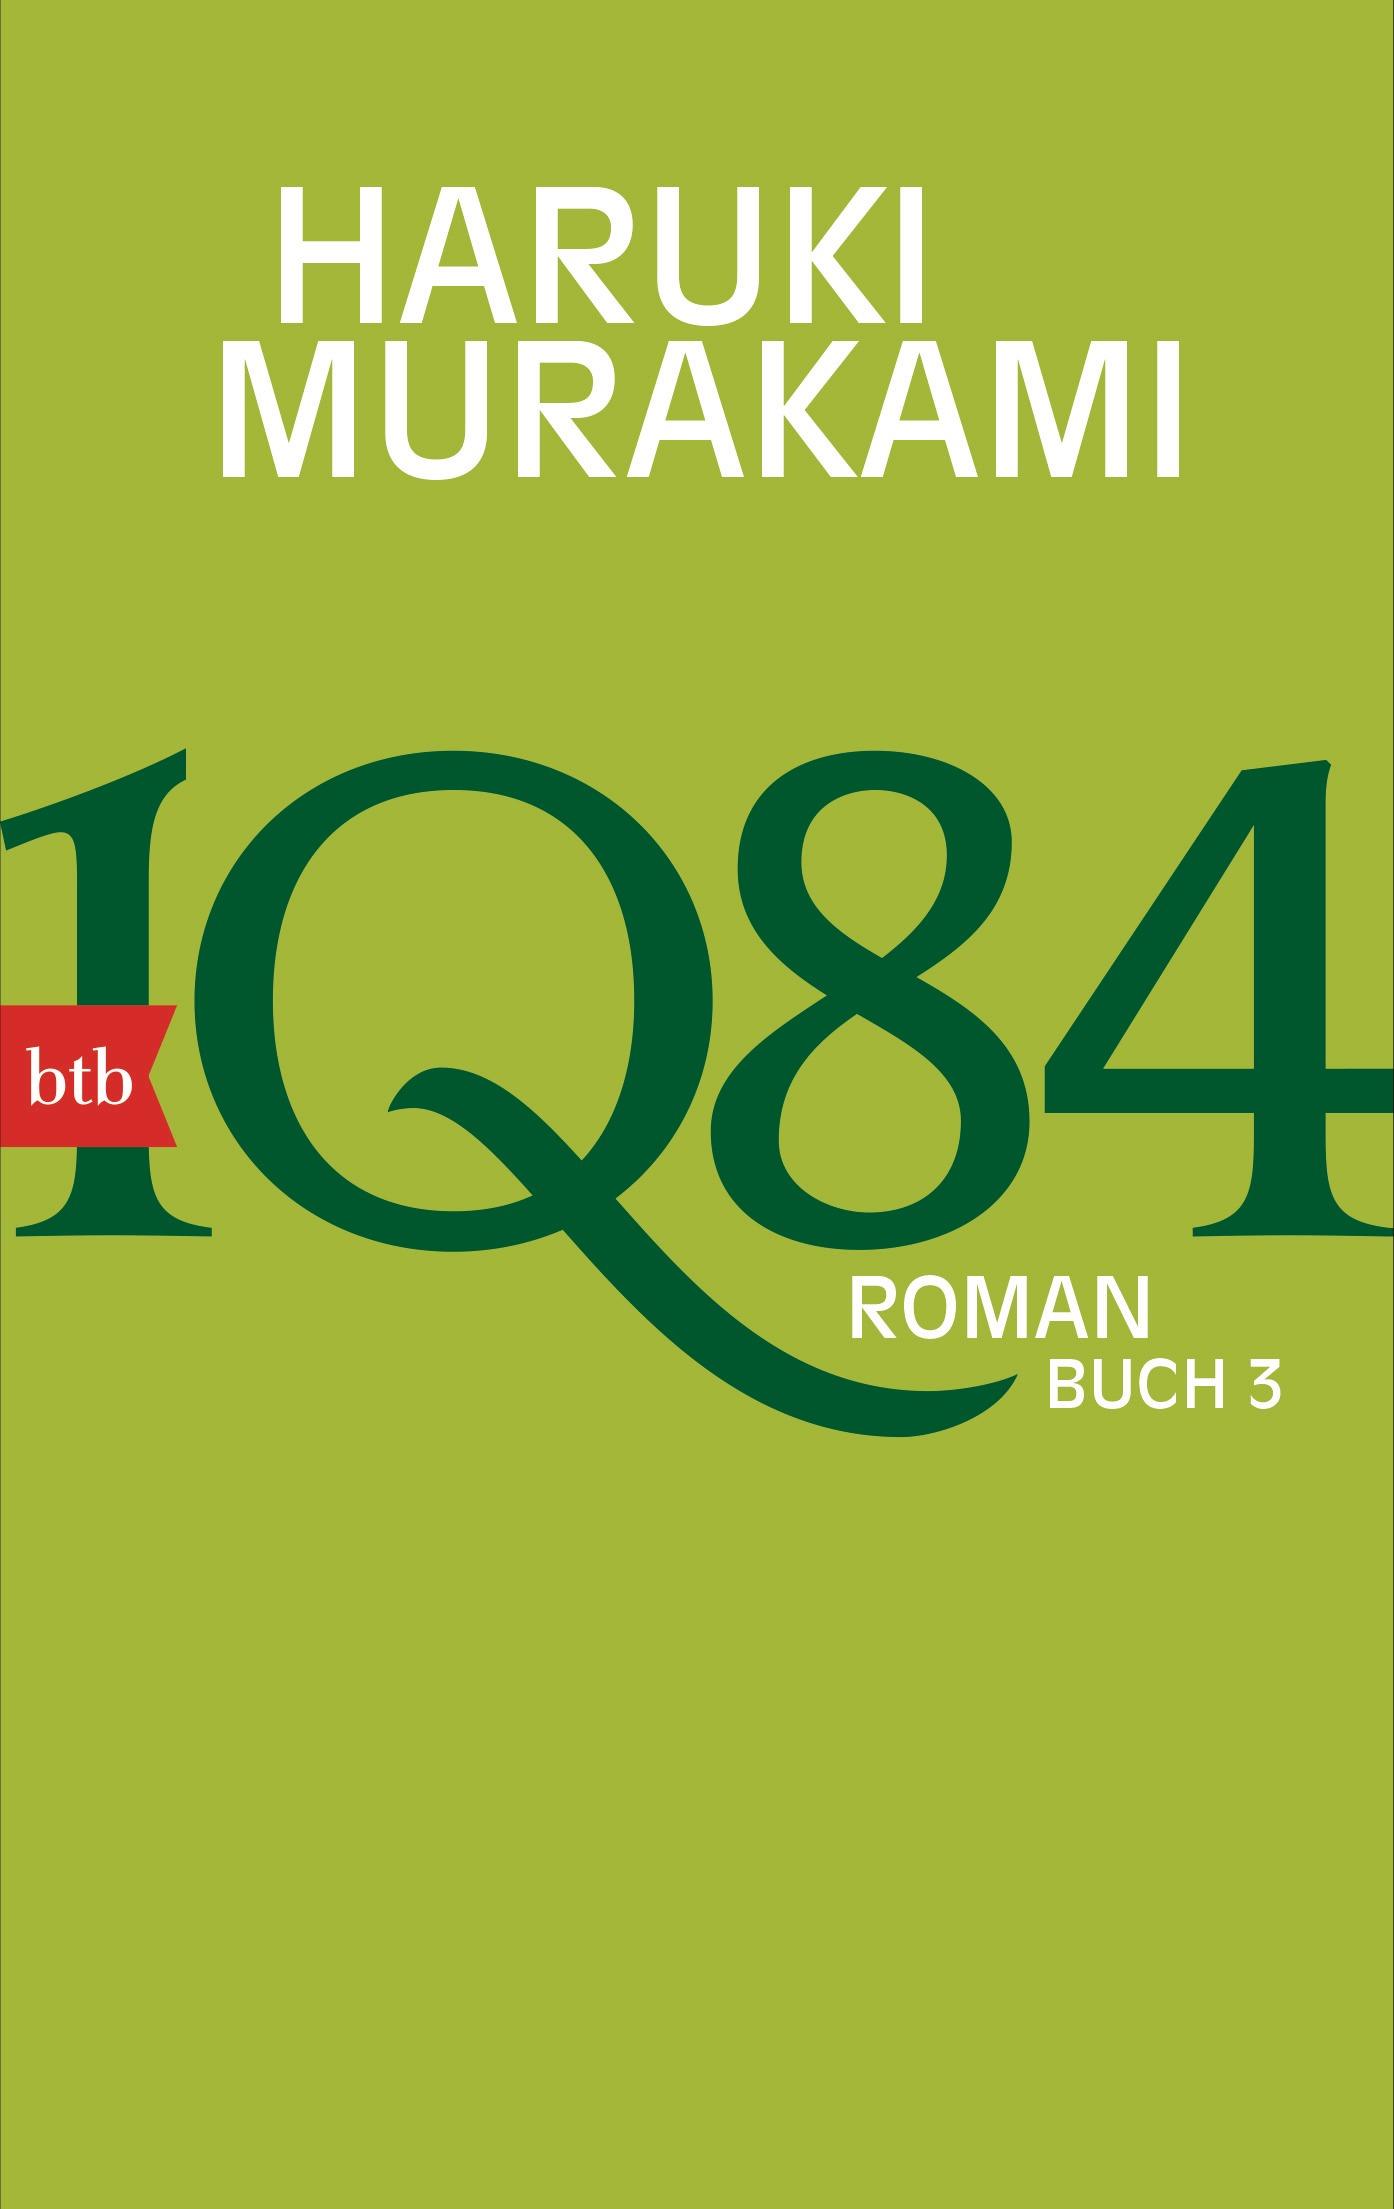 1Q84  (Buch 3), Haruki Murakami